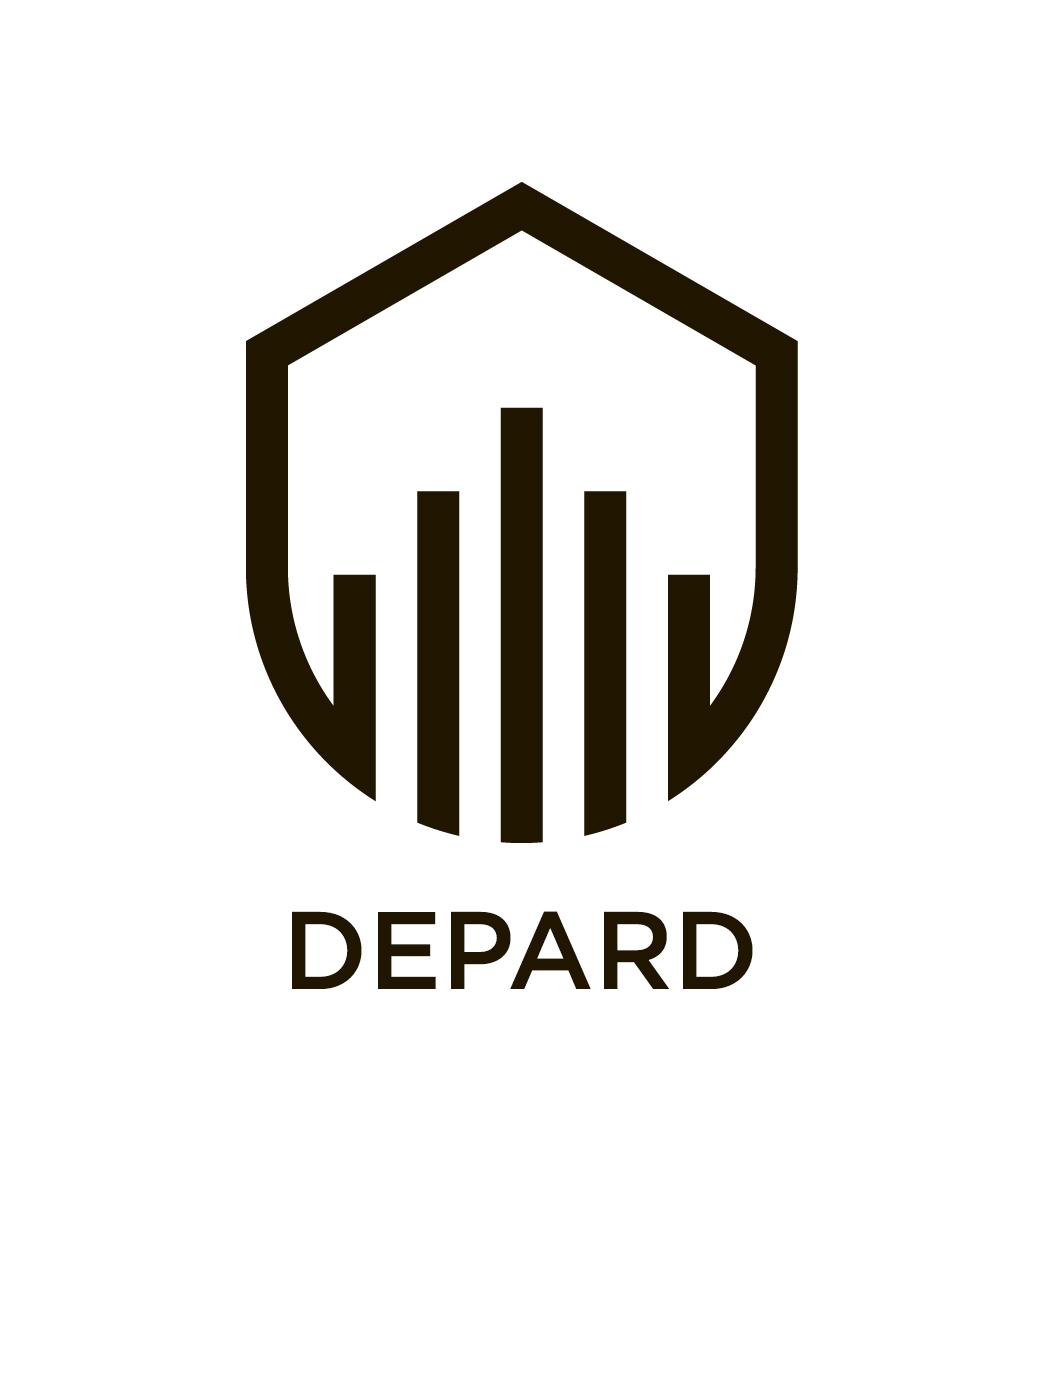 Логотип для компании (услуги недвижимость) фото f_205593561acc274e.jpg